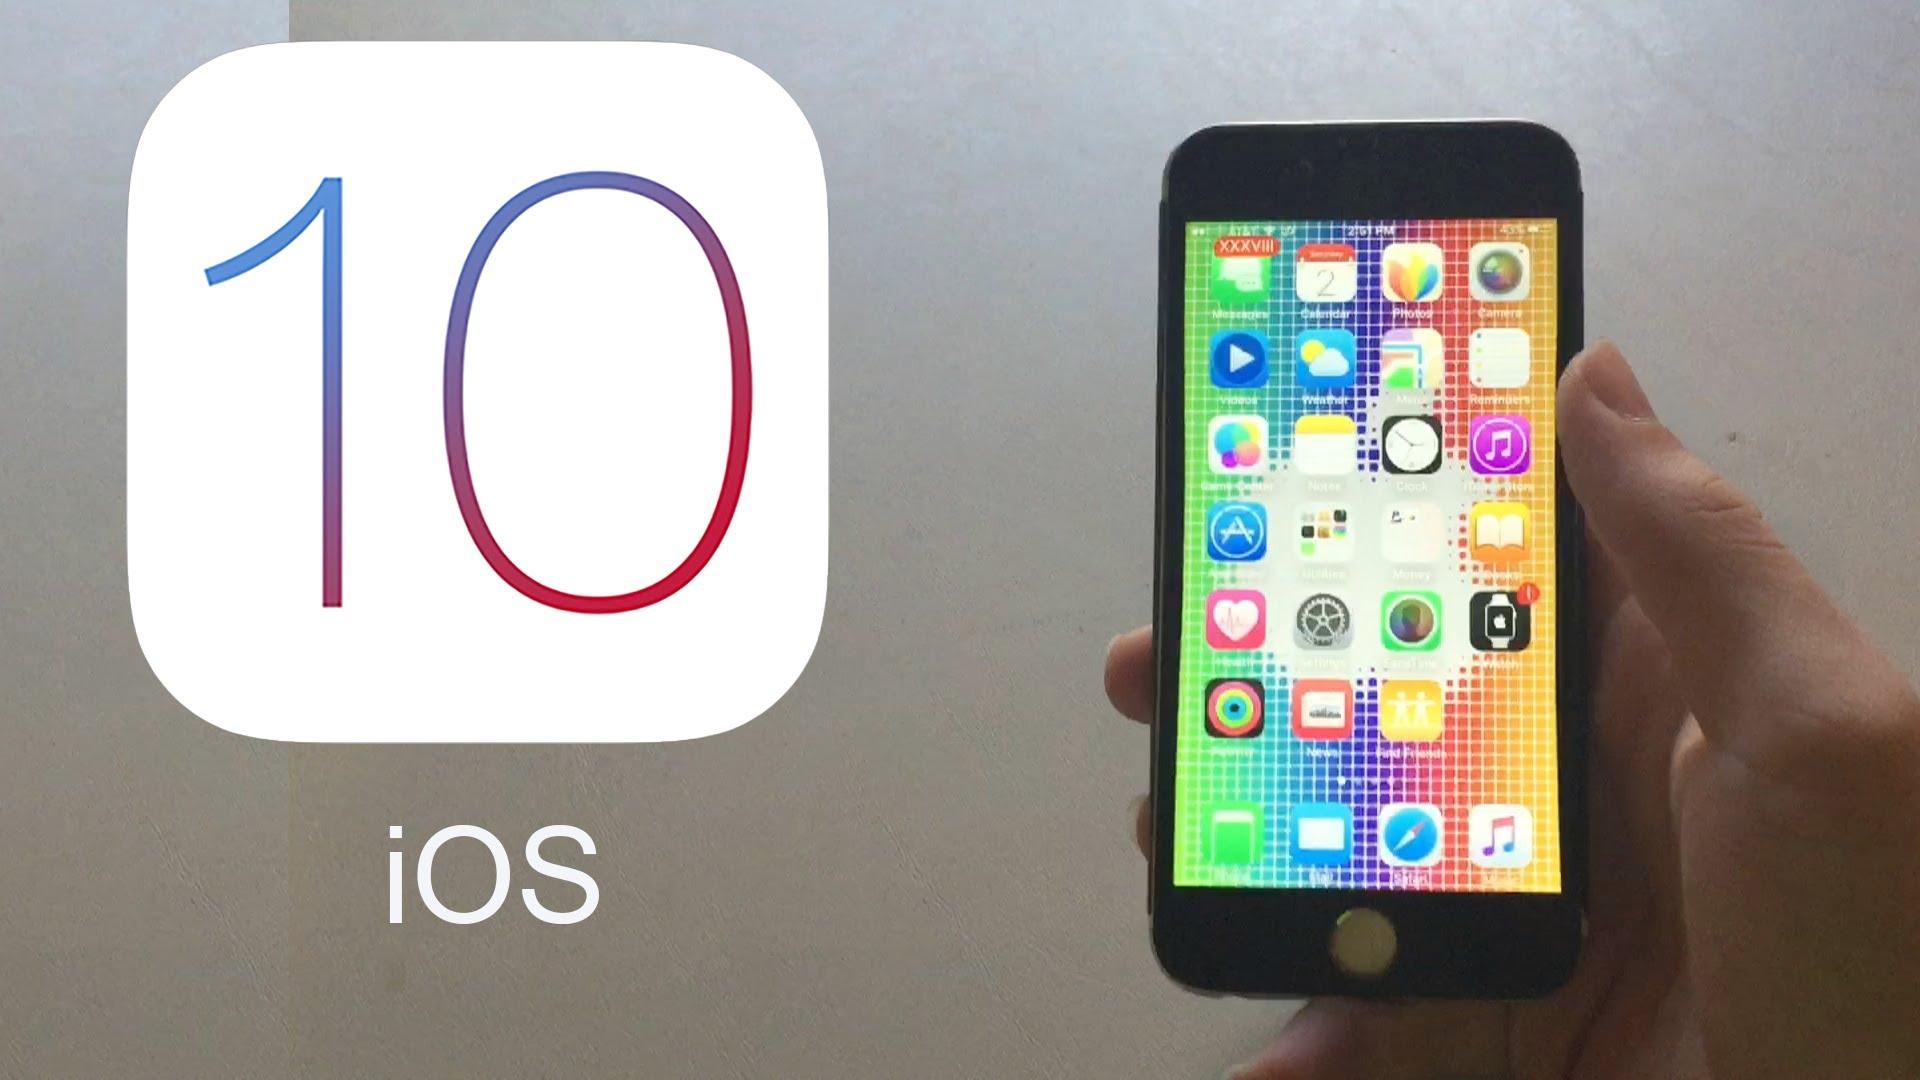 Noi actualizari de la Apple: iOS 10.3 lansat oficial